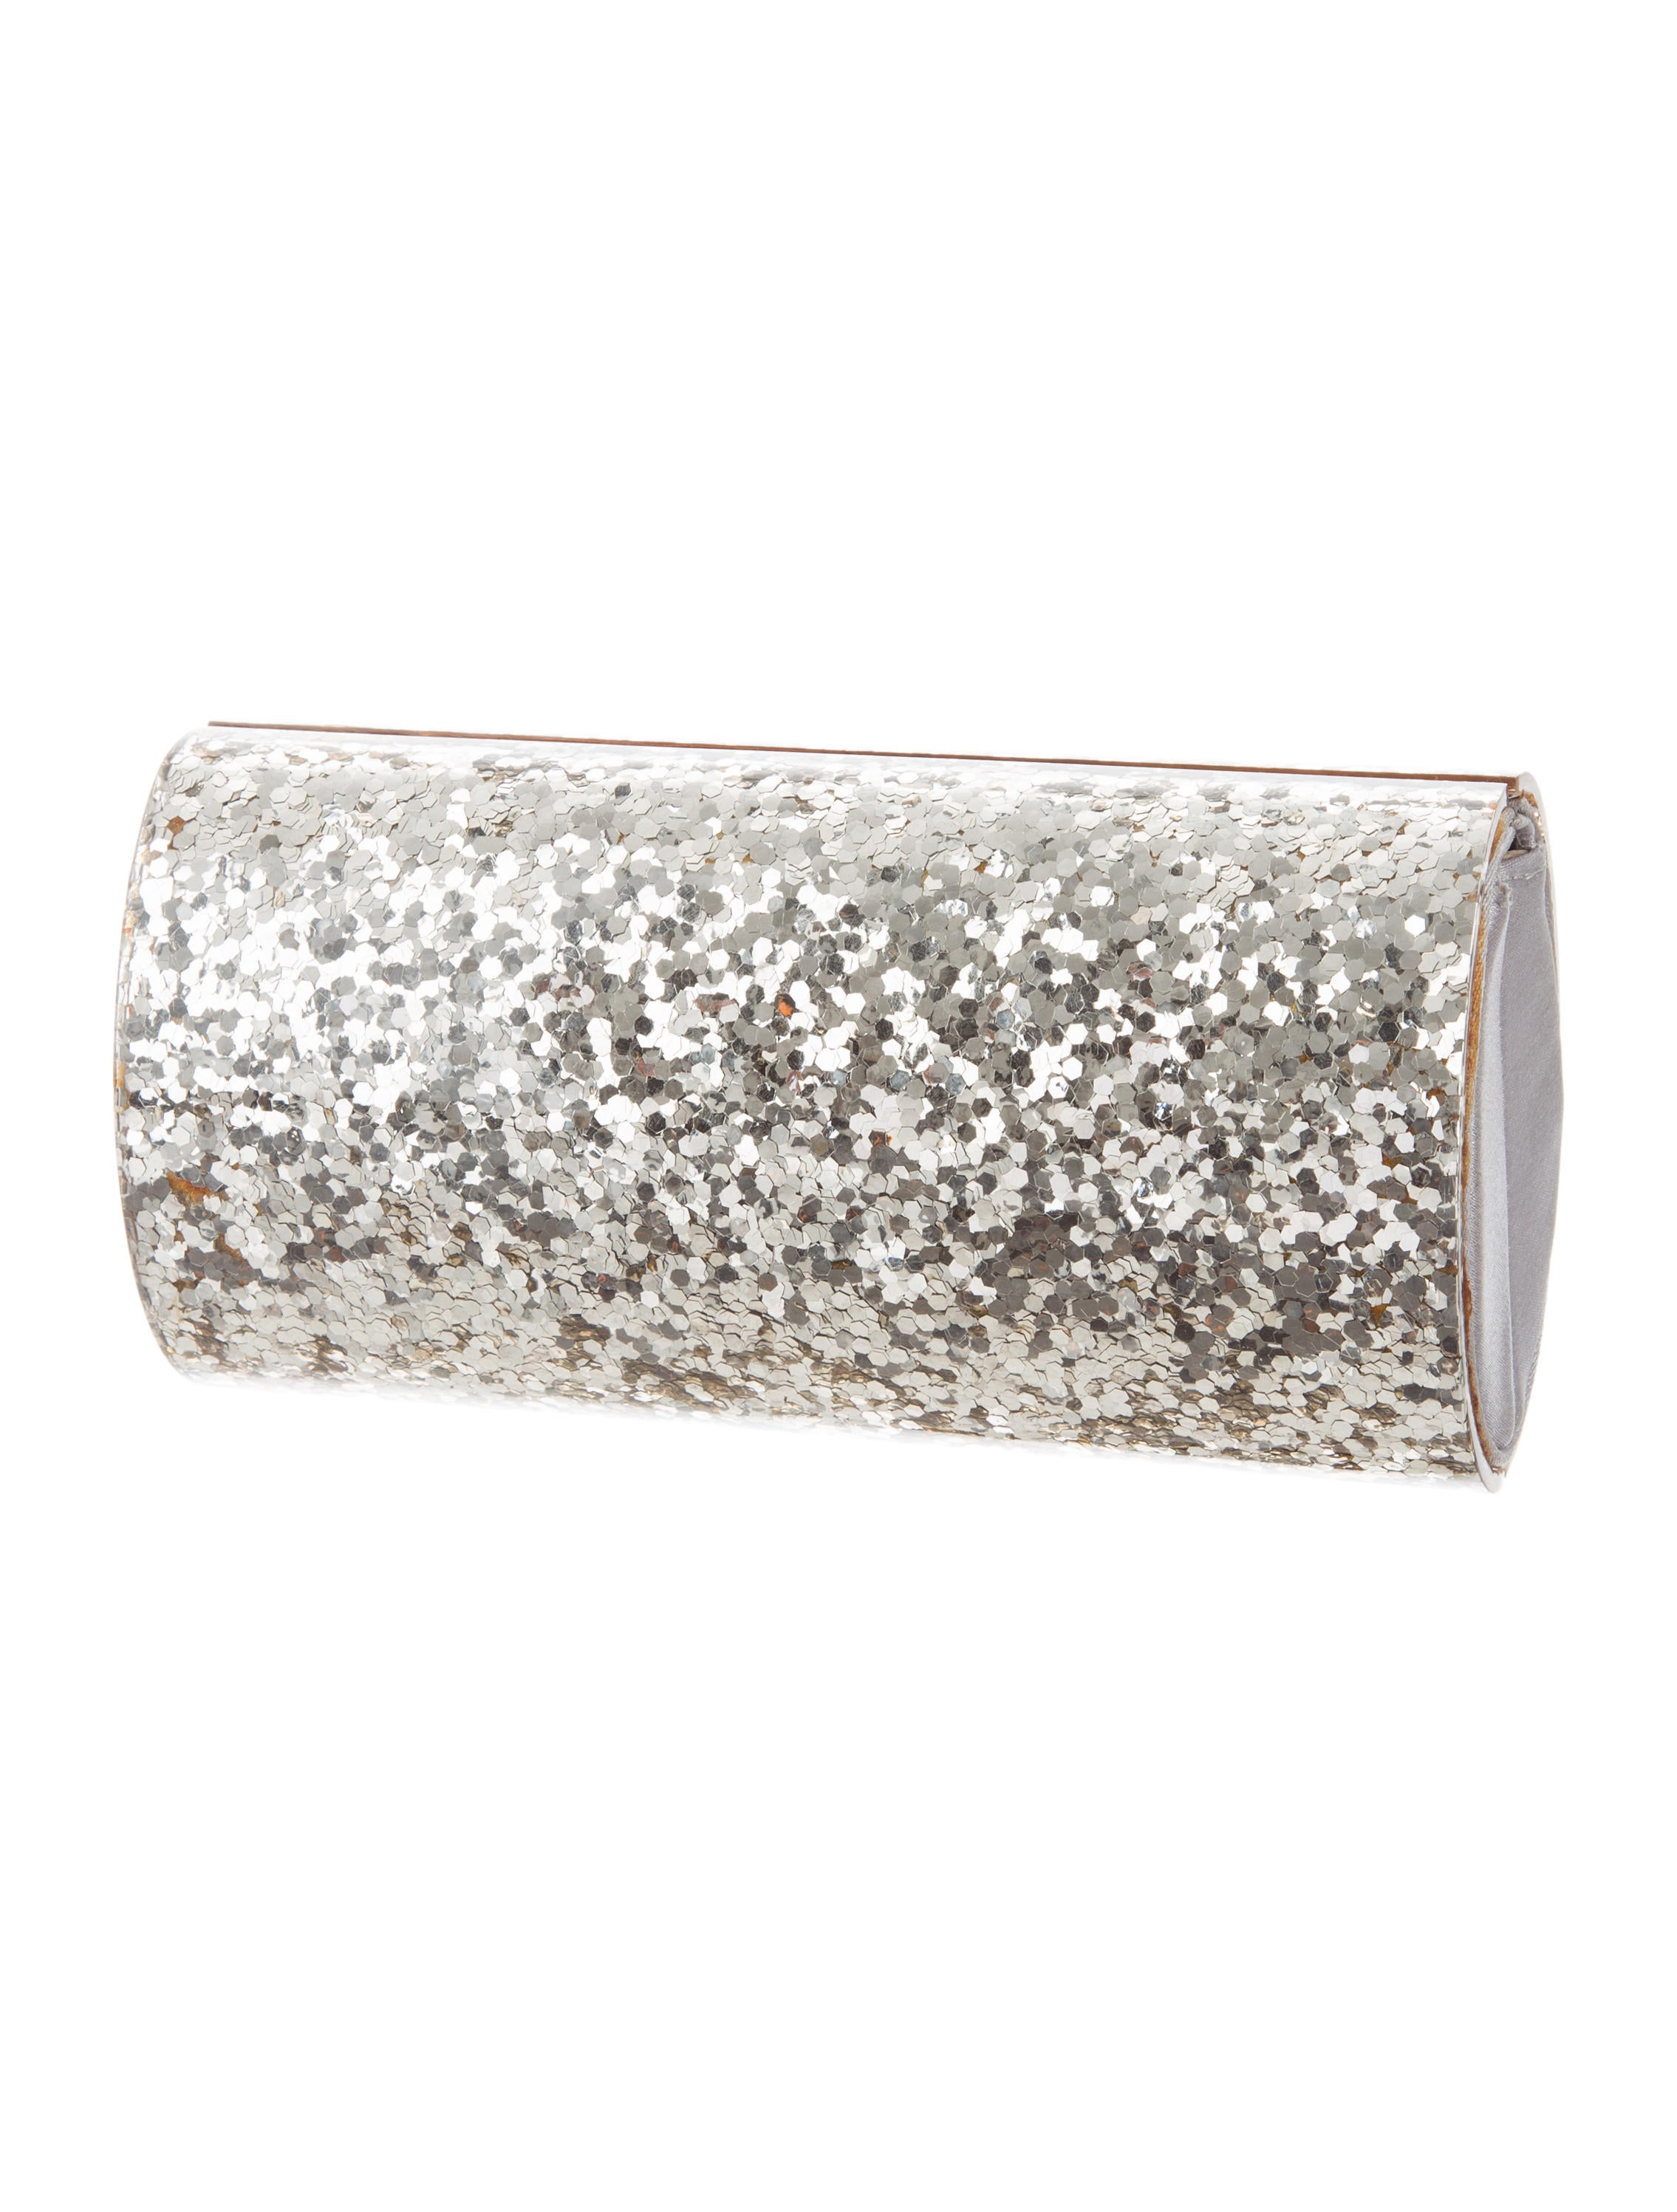 Clutch Lining Adhesive : Stuart weitzman acrylic glitter clutch handbags